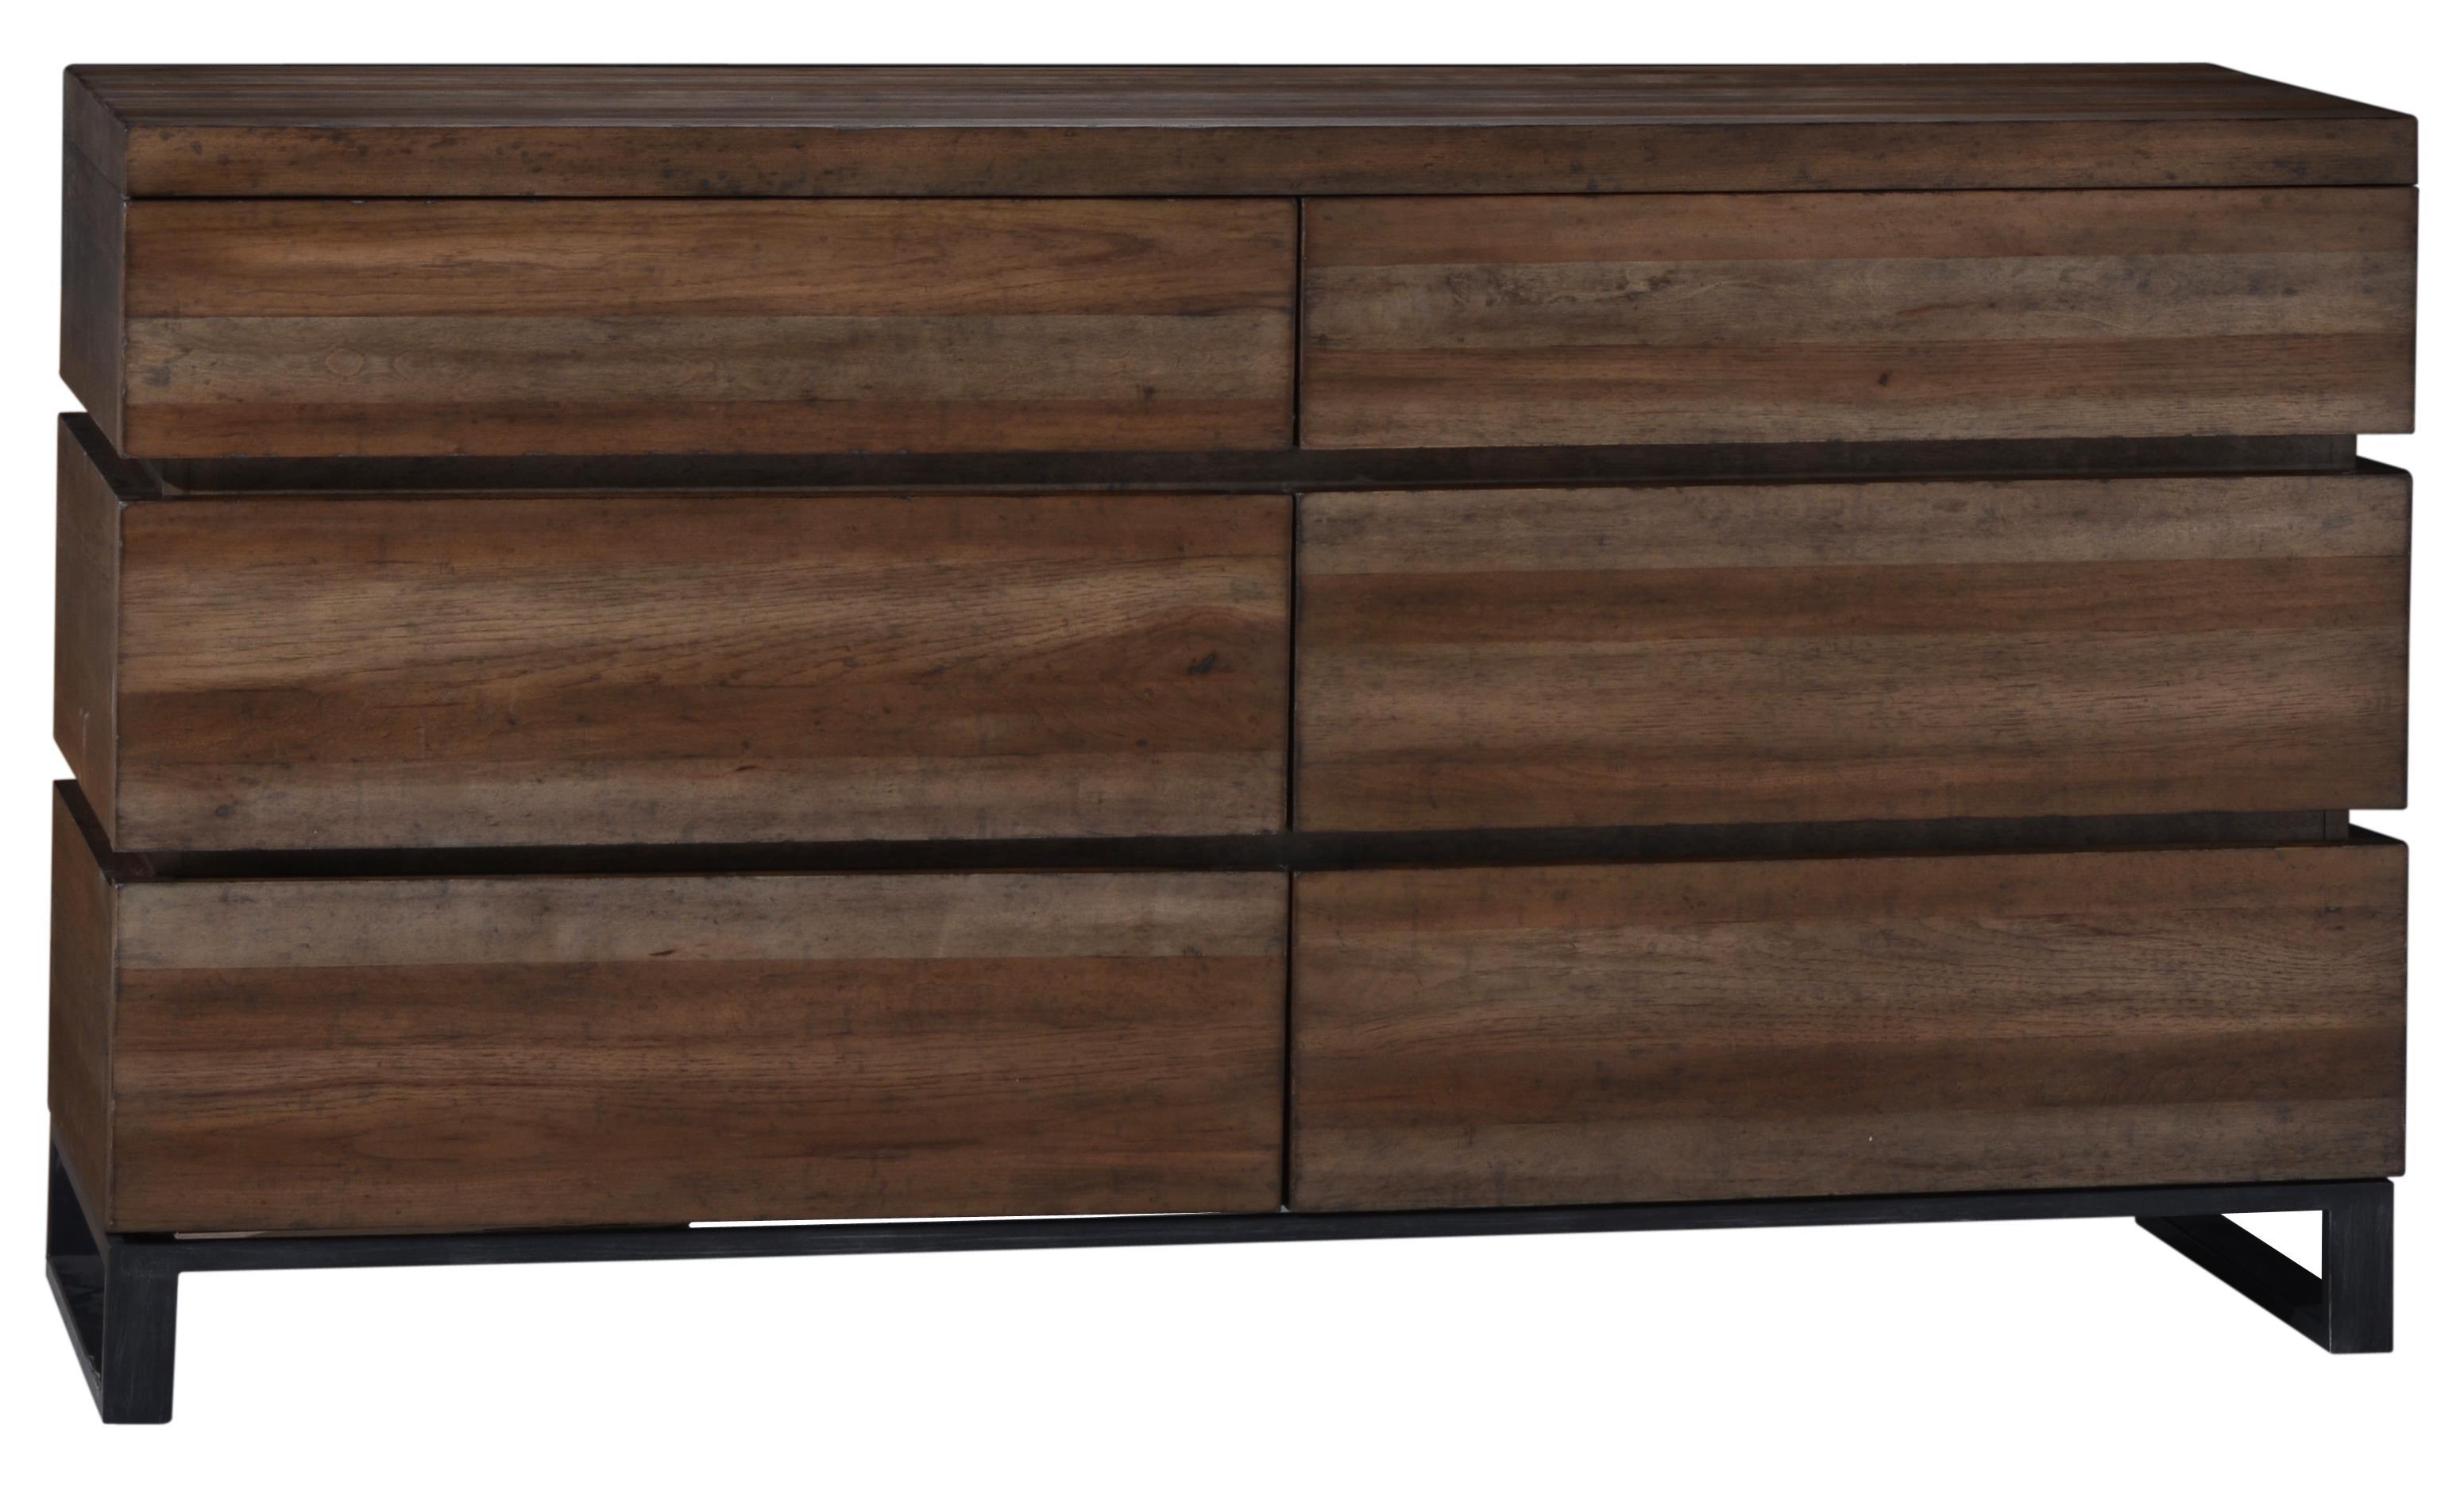 Belfort Signature Urban Treasures Contemporary Shaw Dresser - Item Number: 223130-2302